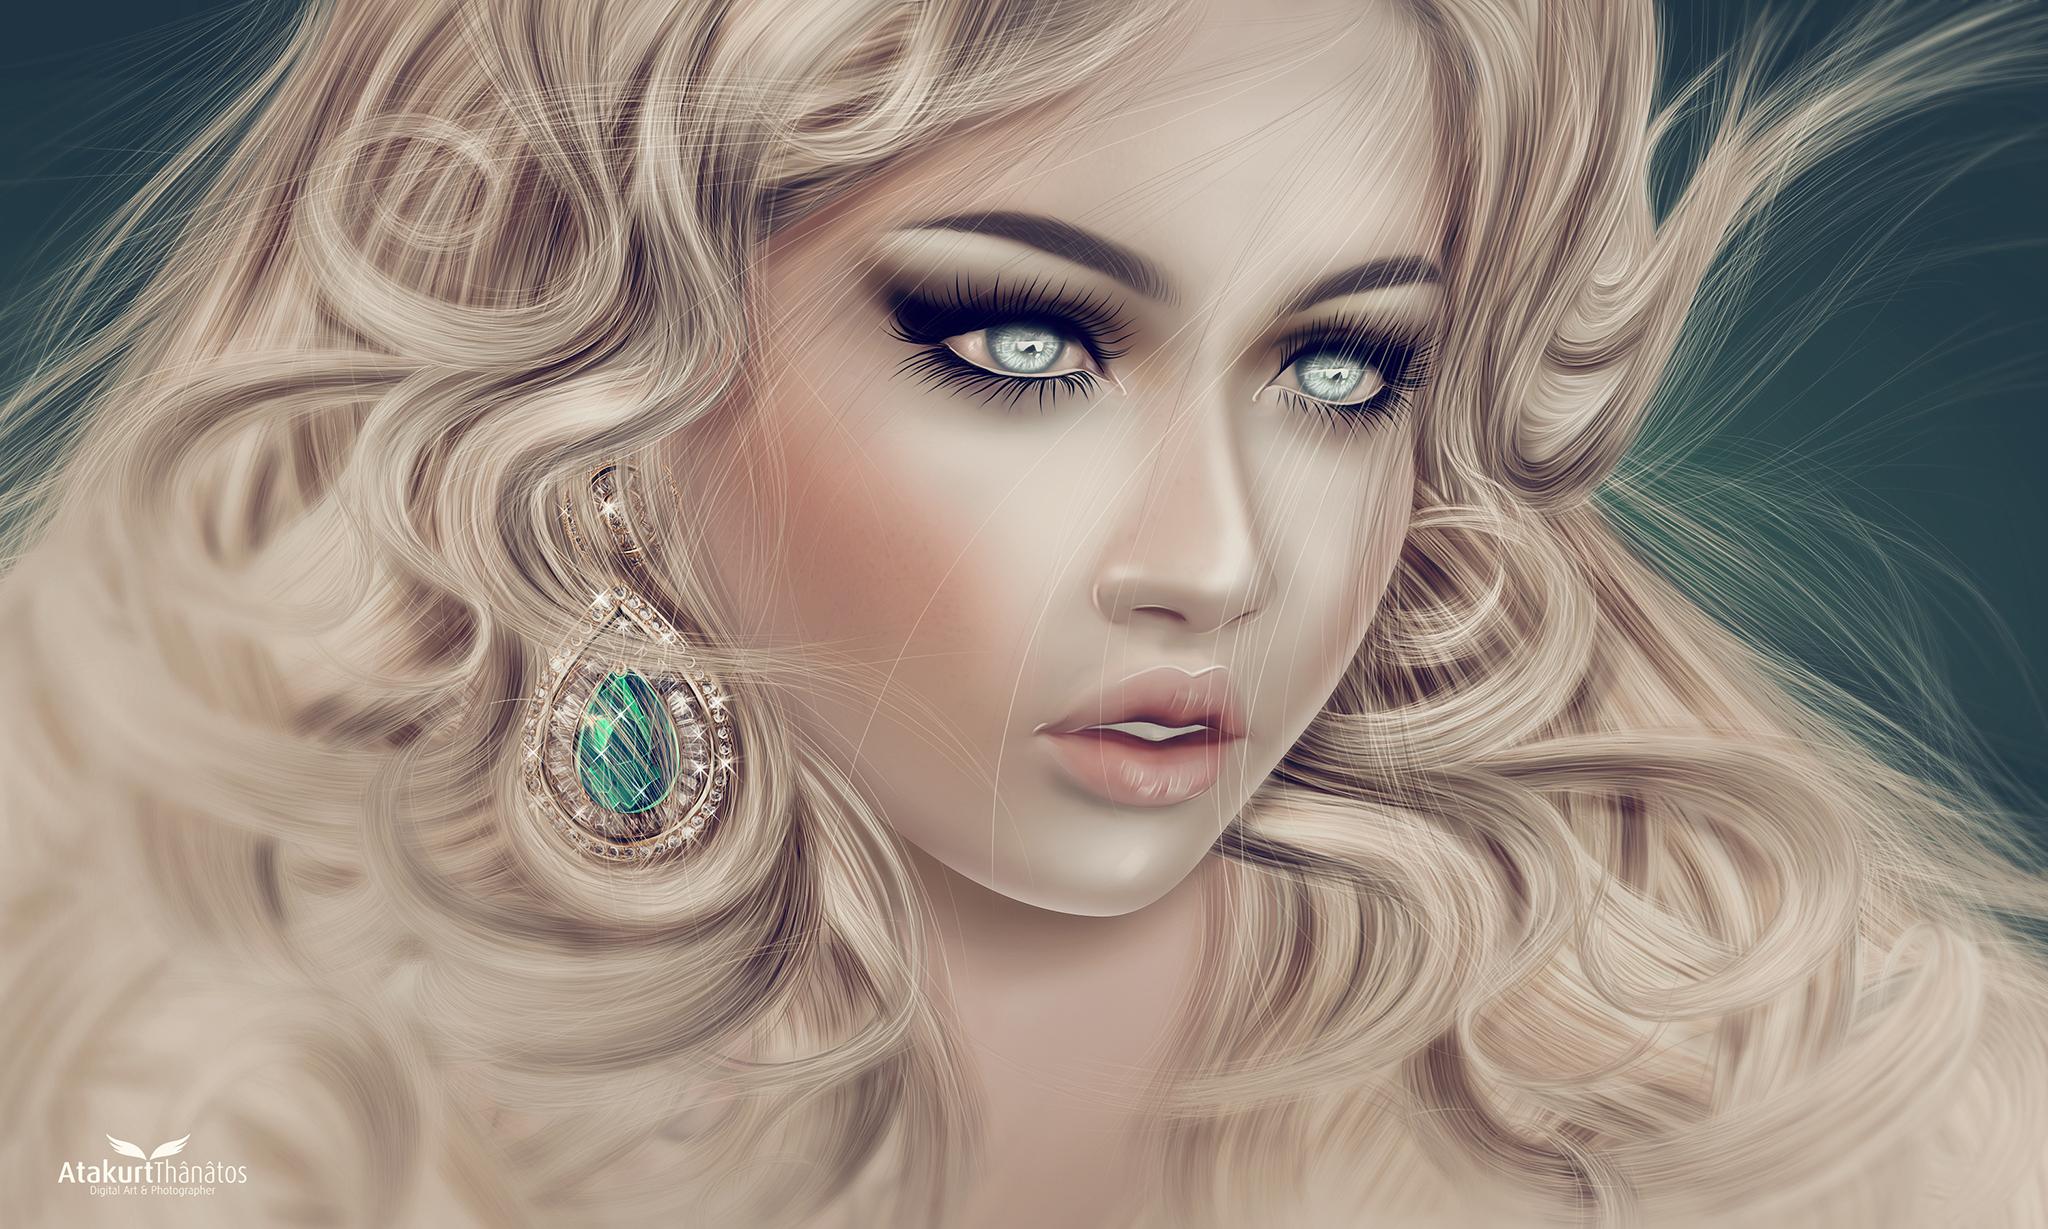 Wallpaper : face, drawing, illustration, model, long hair, blue